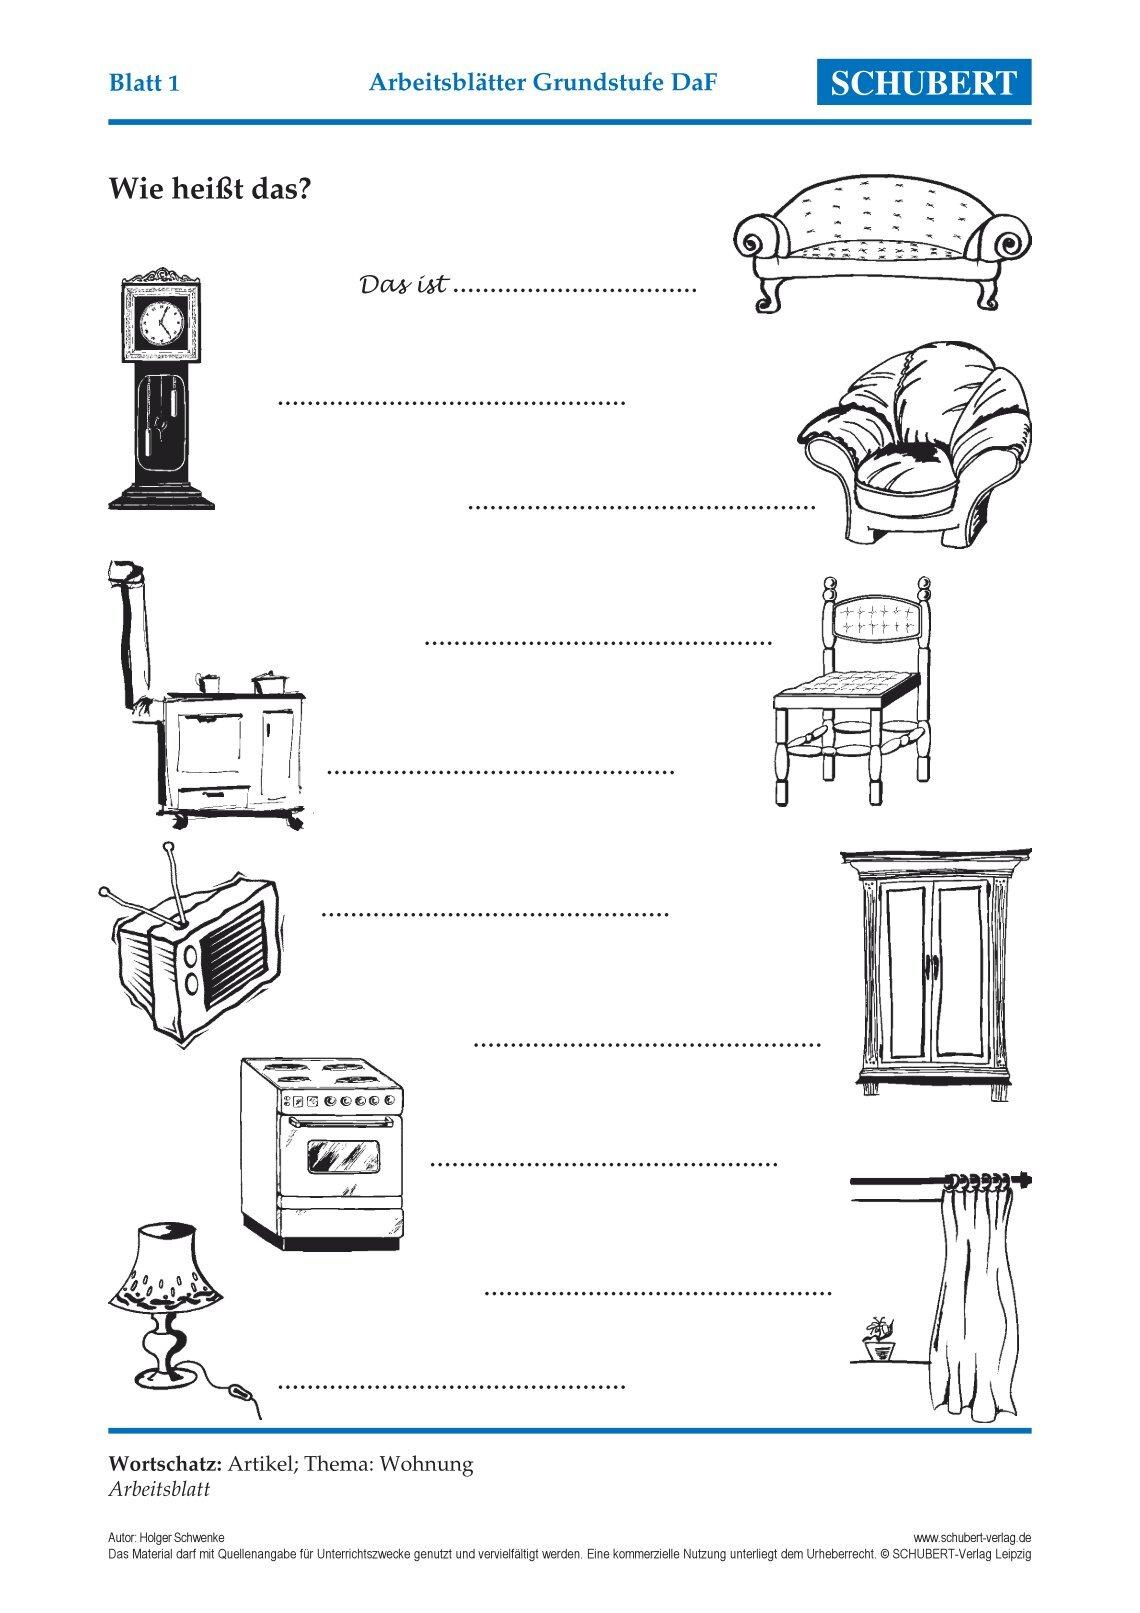 1 free magazines from aufgaben schubert verlag de. Black Bedroom Furniture Sets. Home Design Ideas